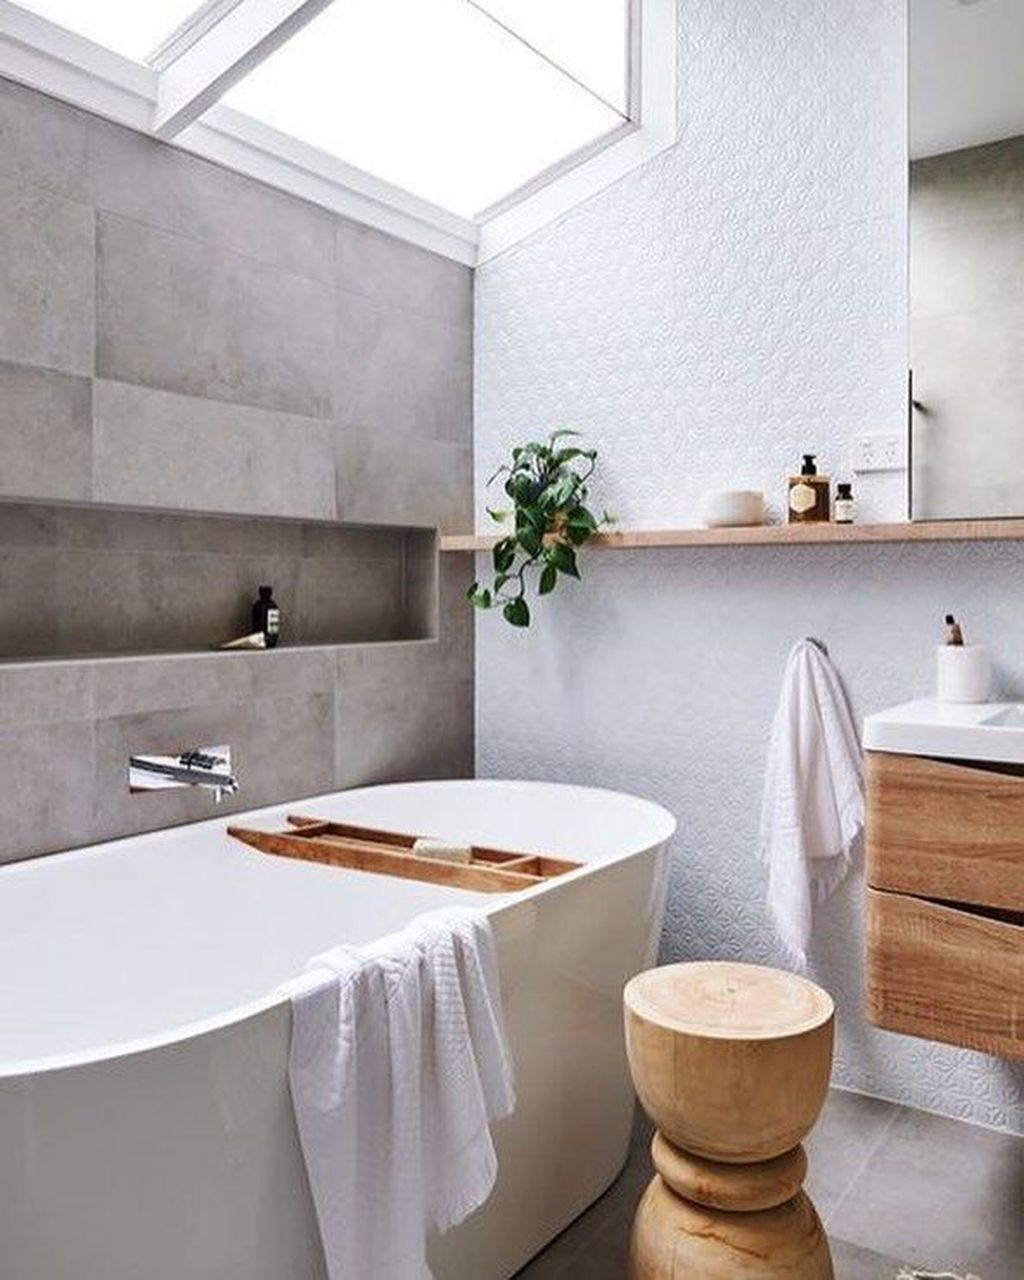 Home Design Ideas The Trendiest Washroom Tiles For You: 28 Gorgeous Modern Scandinavian Interior Design Ideas